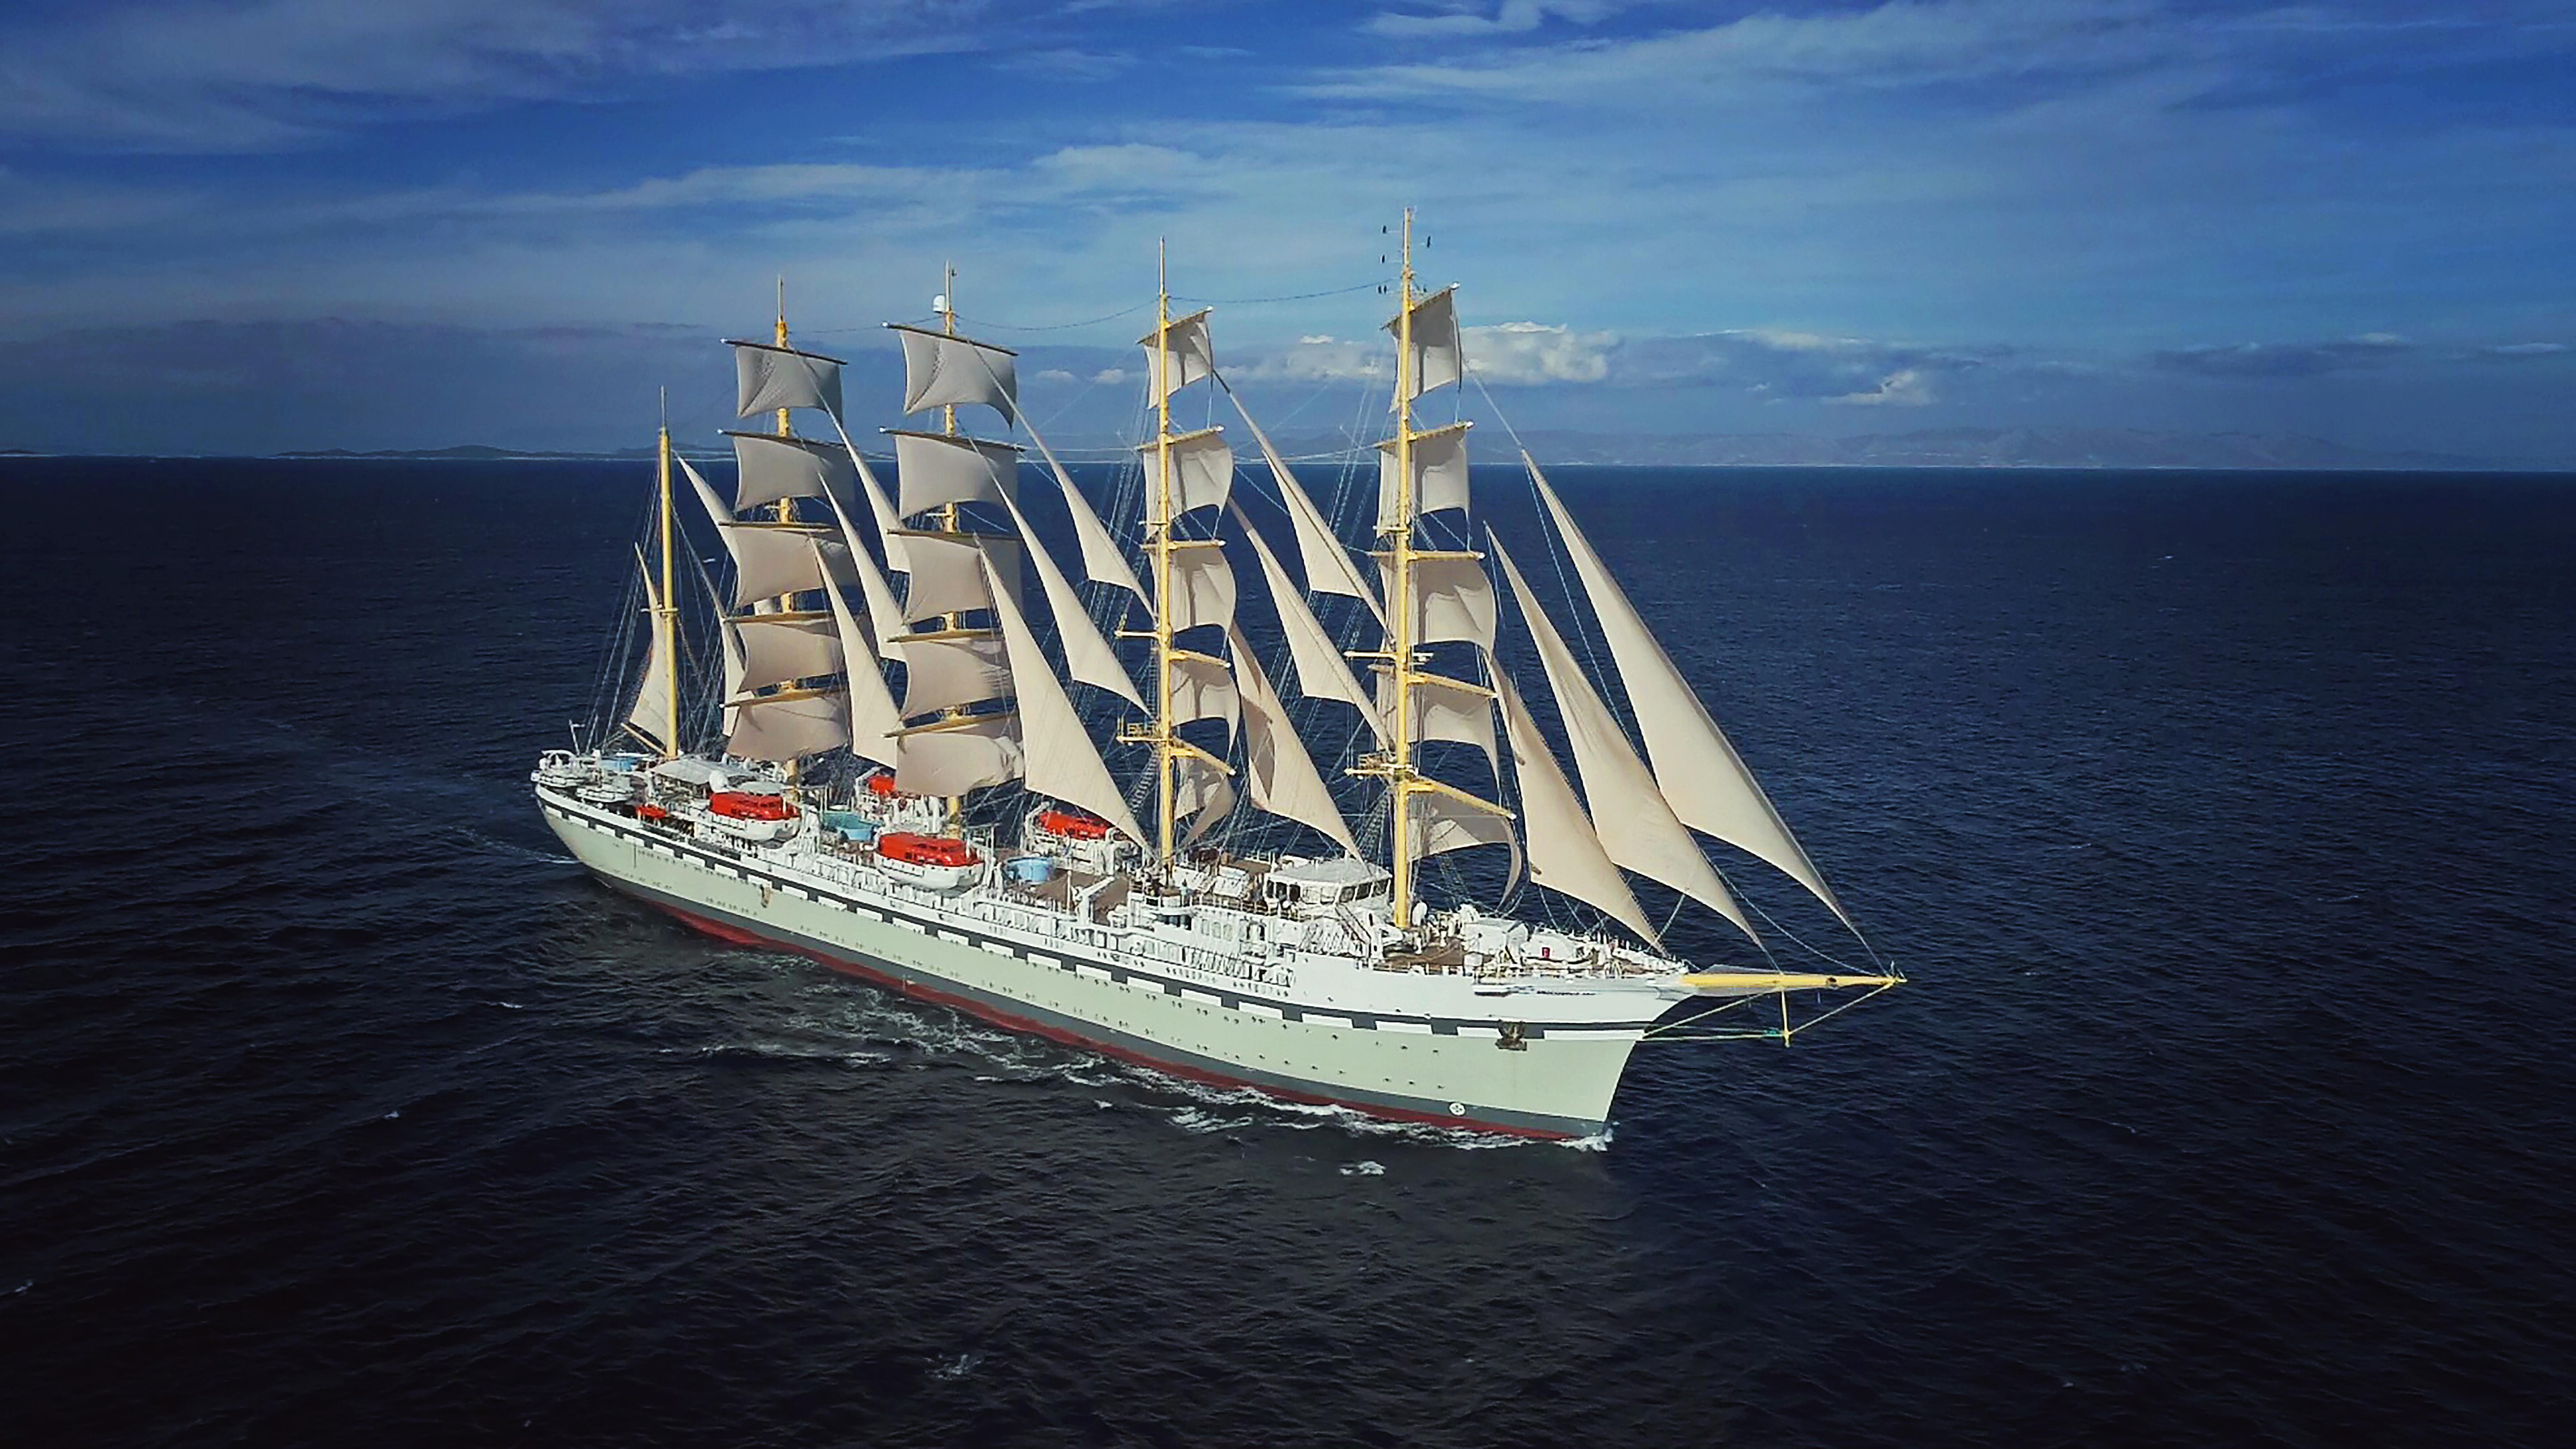 Tradewinds Voyages' tall ship, Golden Horizon.